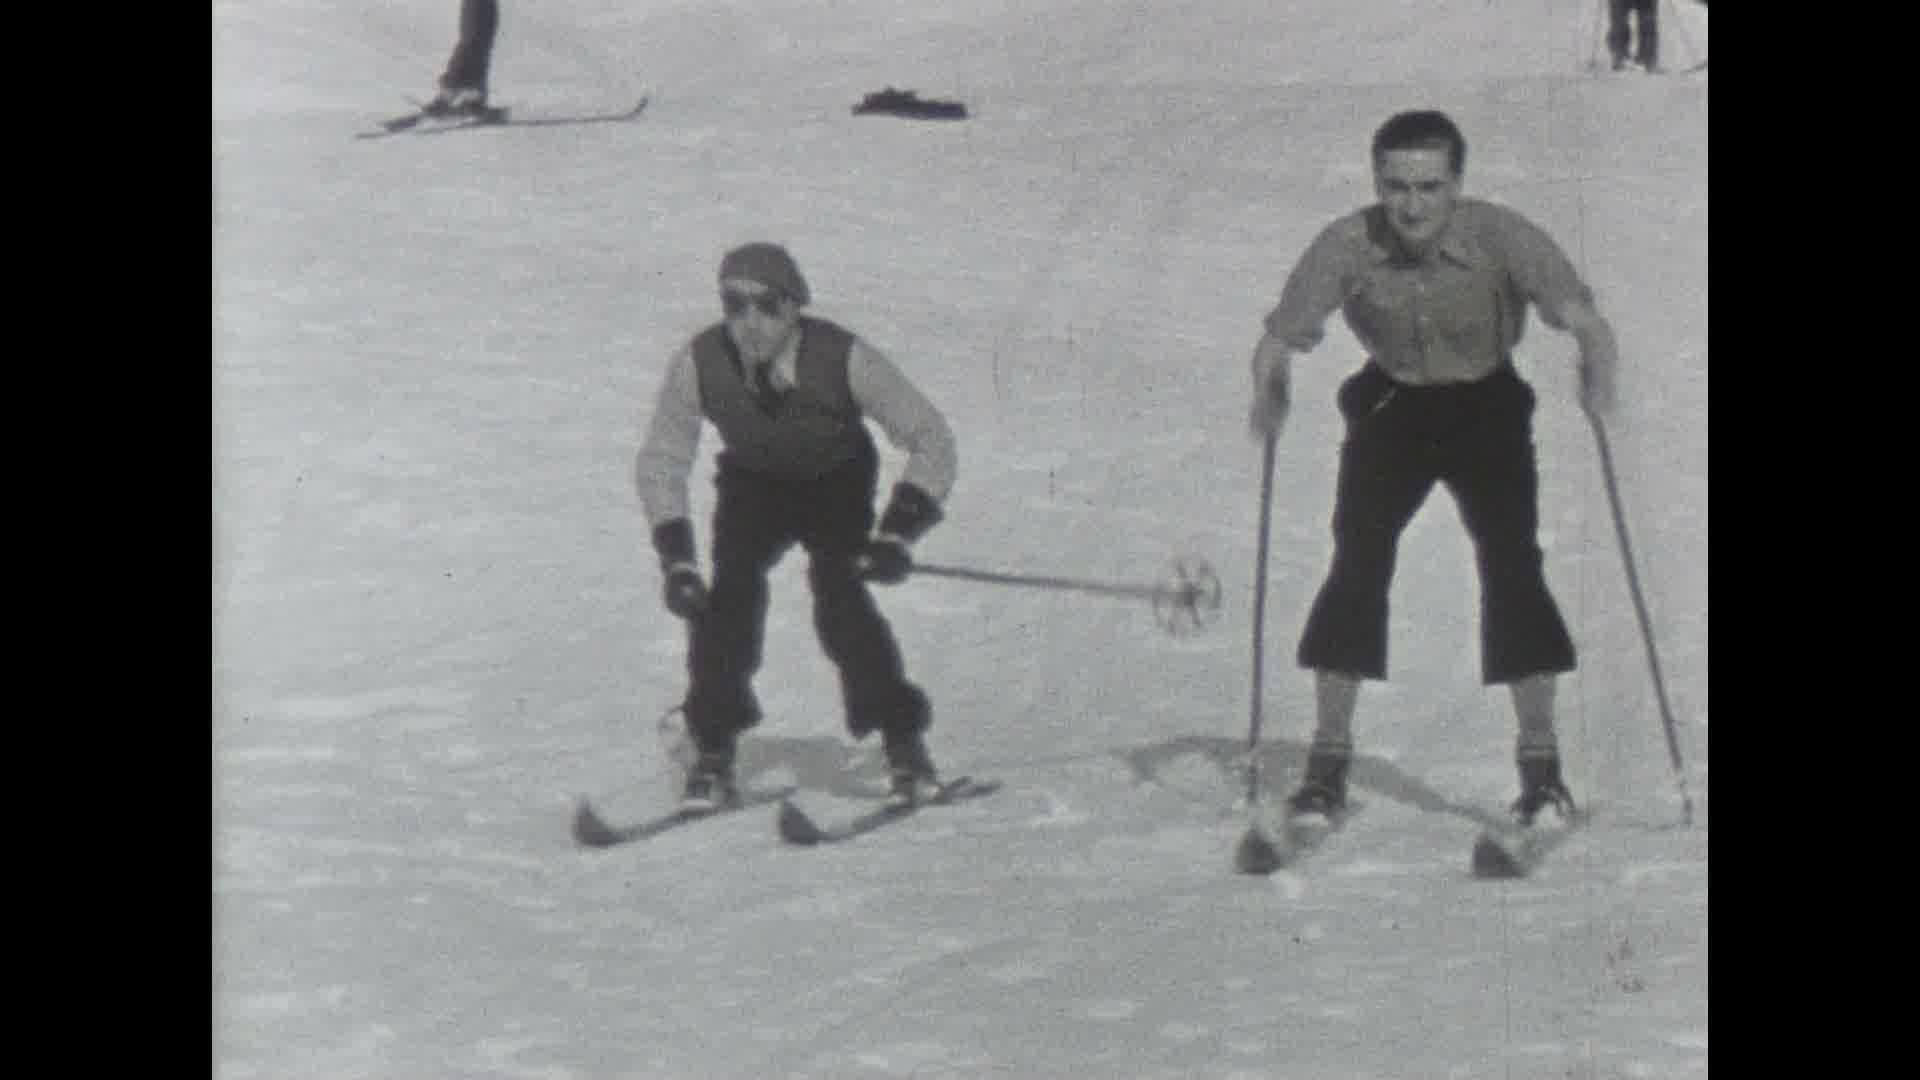 Ski Heil ! Zürs, février 1935 - février 1936